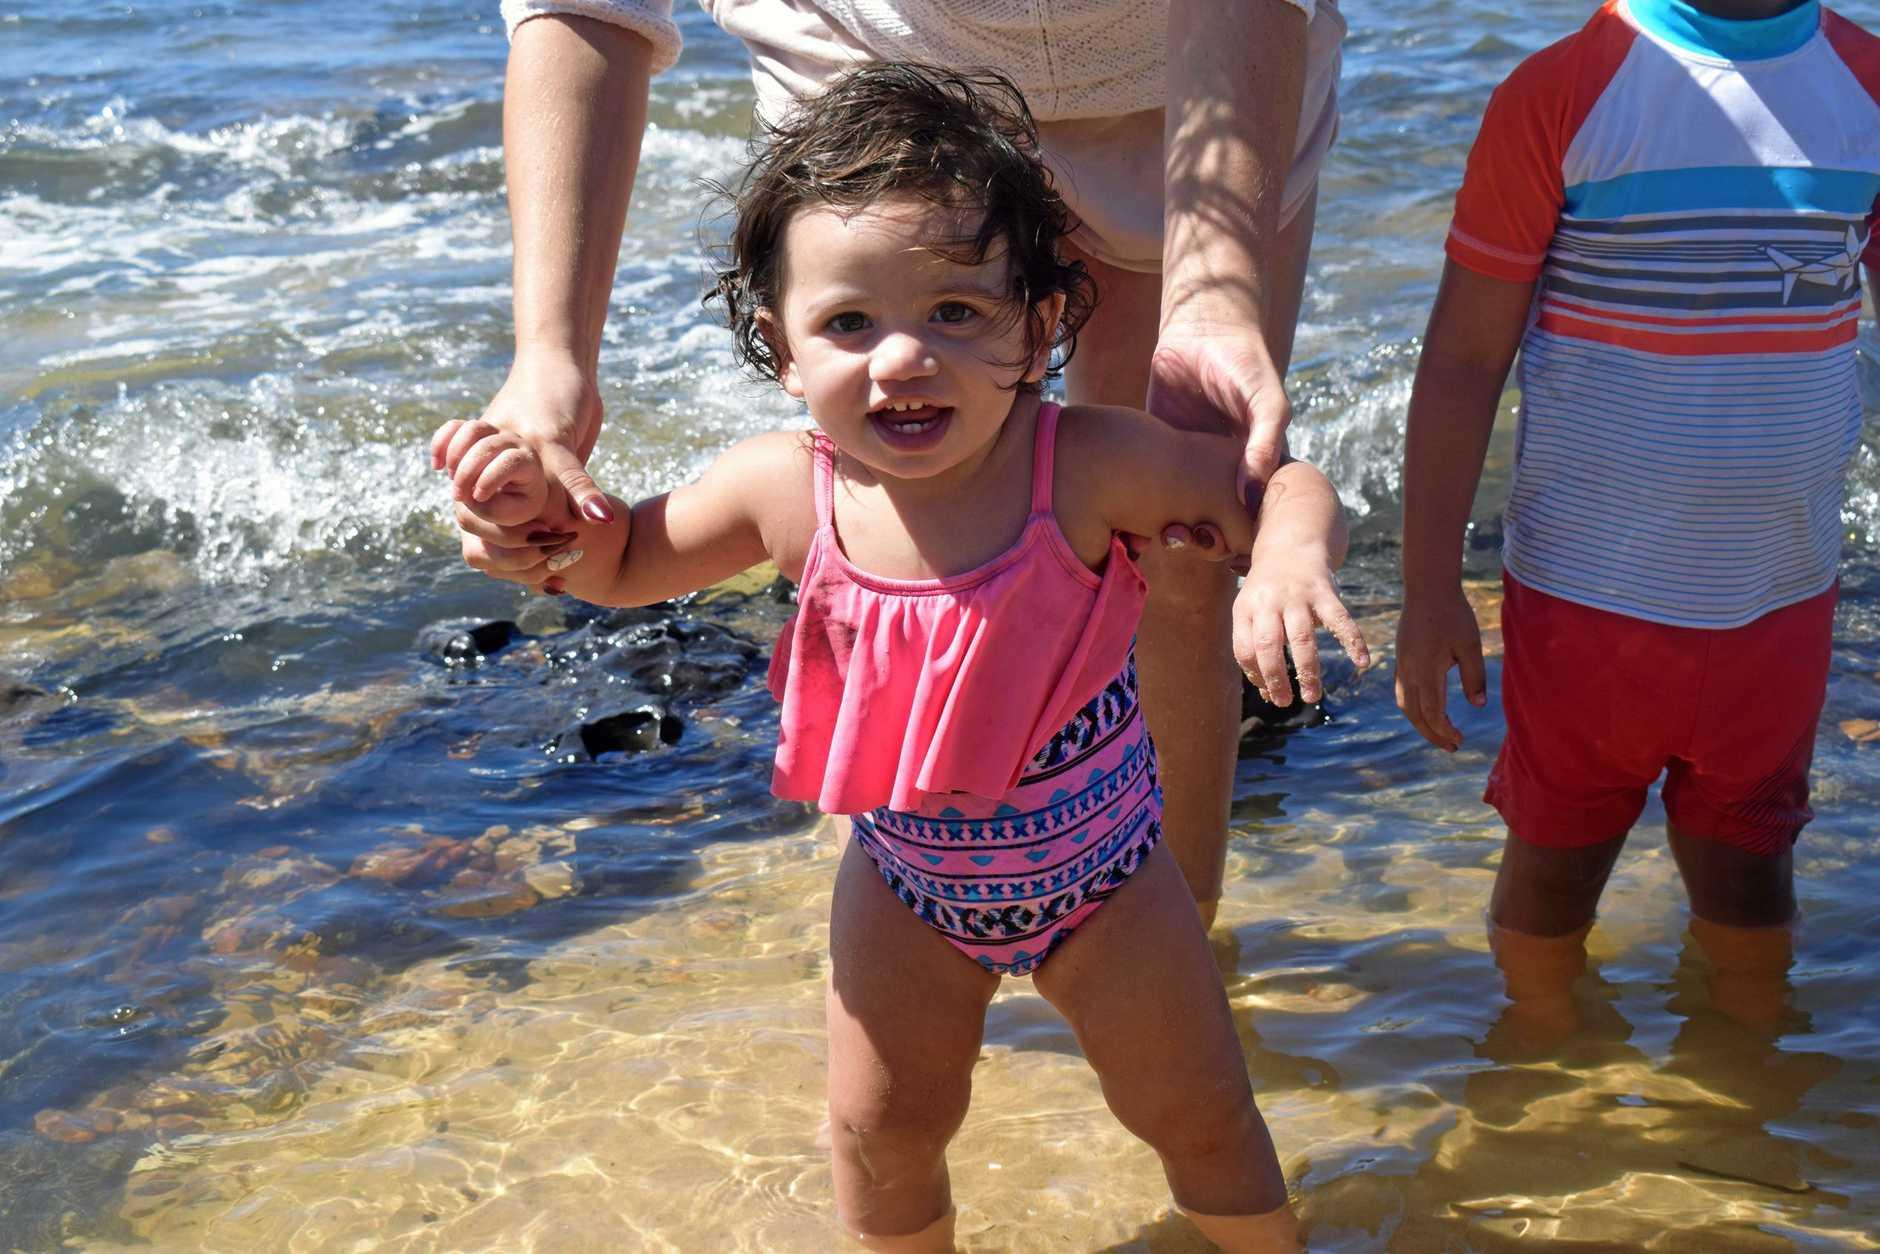 Tazanna Williams, 1, enjoys a quick dip at Mudlo Rocks on Sunday afternoon.